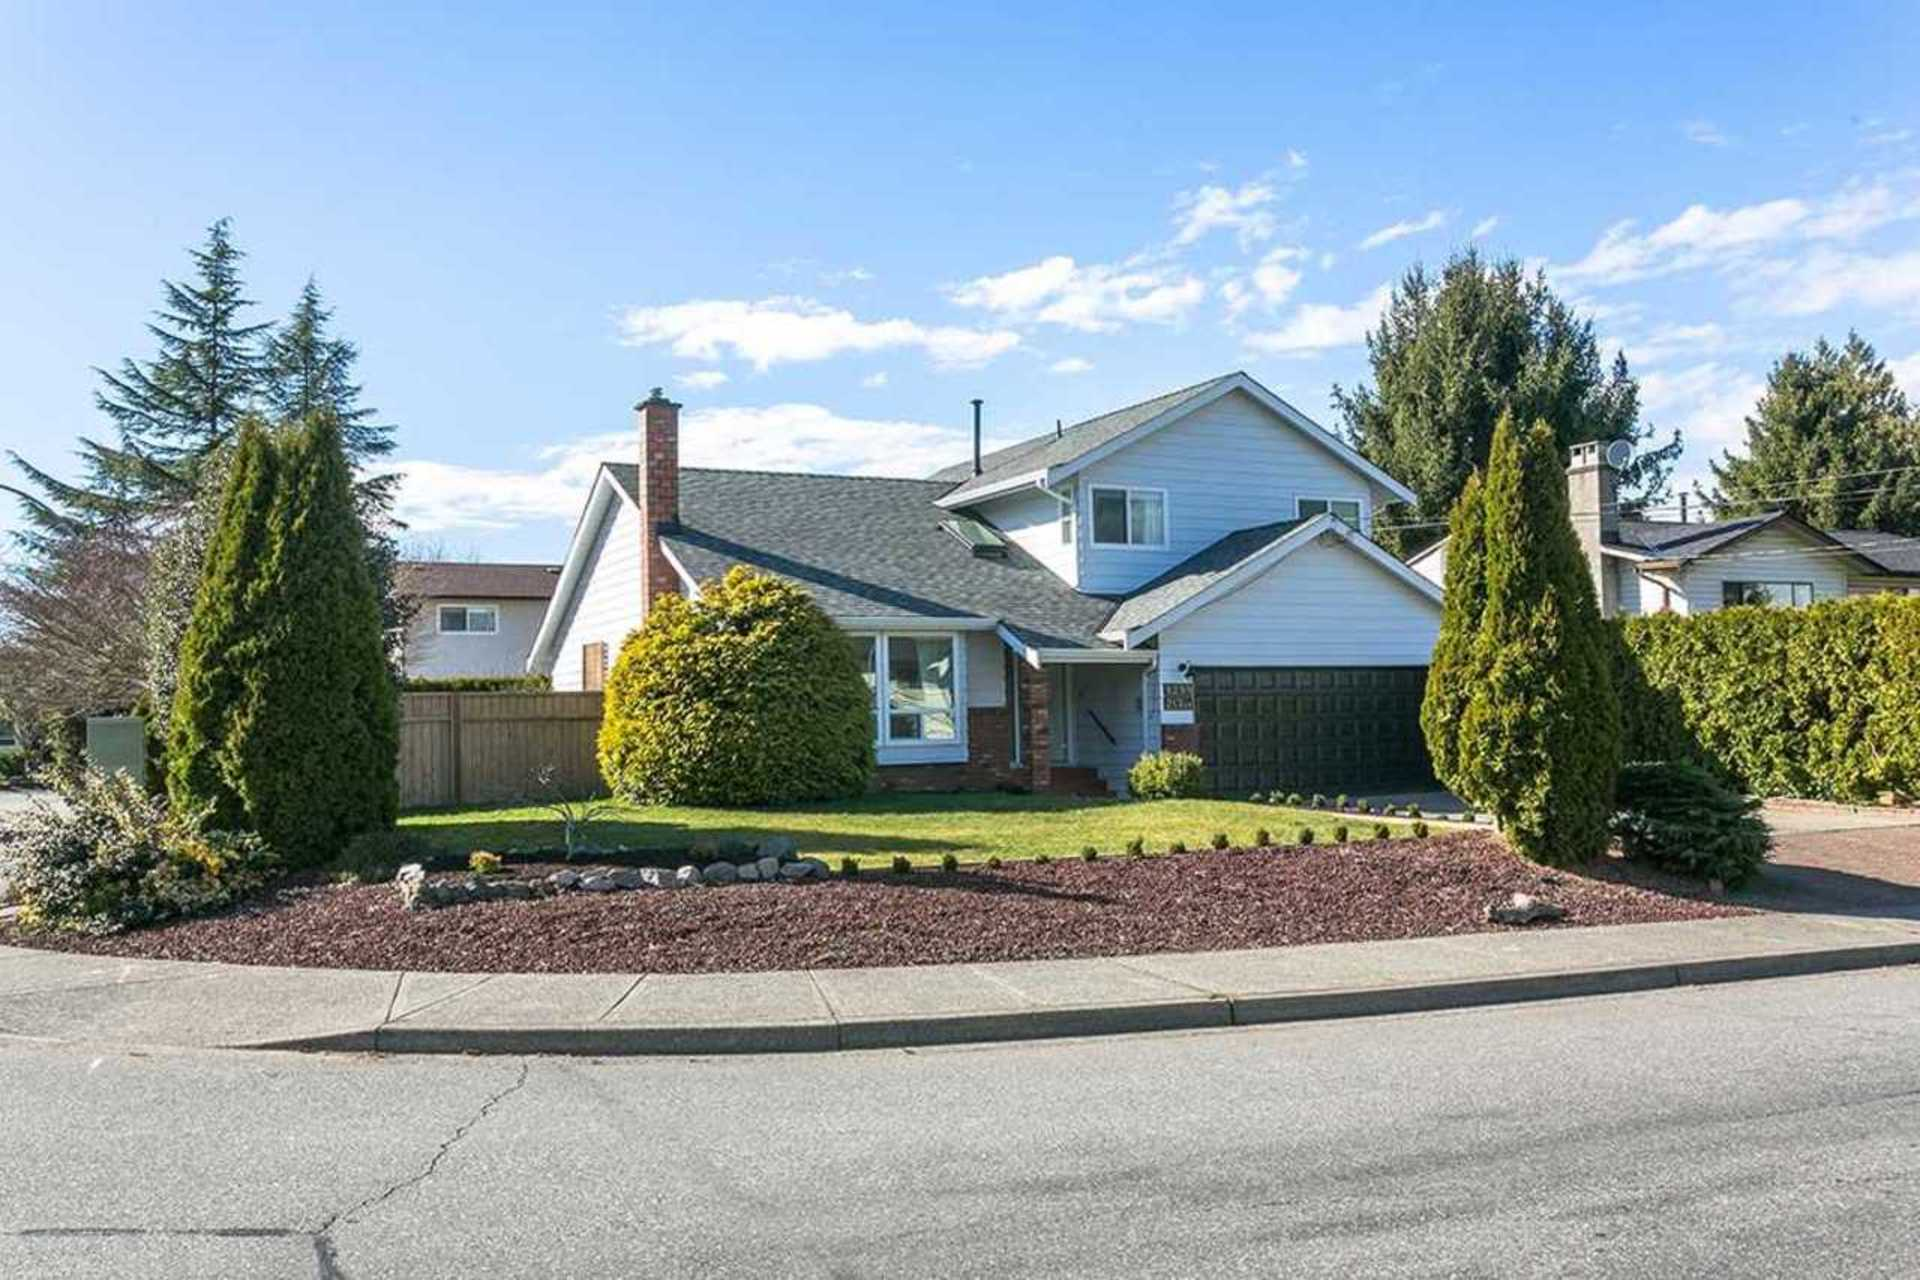 9299-213-street-walnut-grove-langley-20 at 9299 213 Street, Walnut Grove, Langley